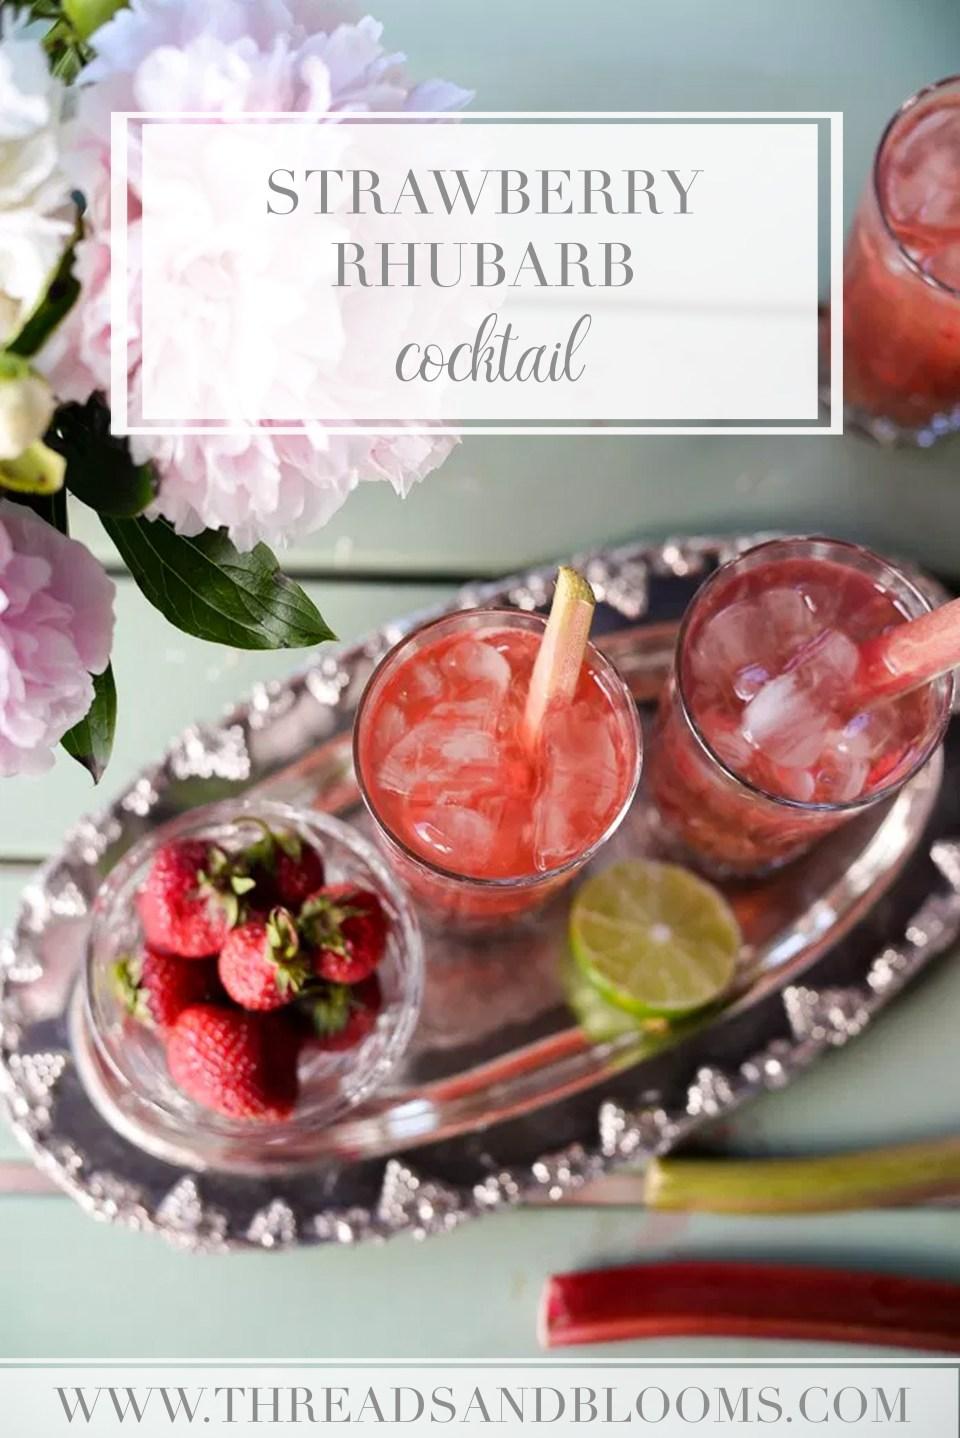 Strawberry Rhubarb Recipes - Strawberry Rhubarb Cocktail